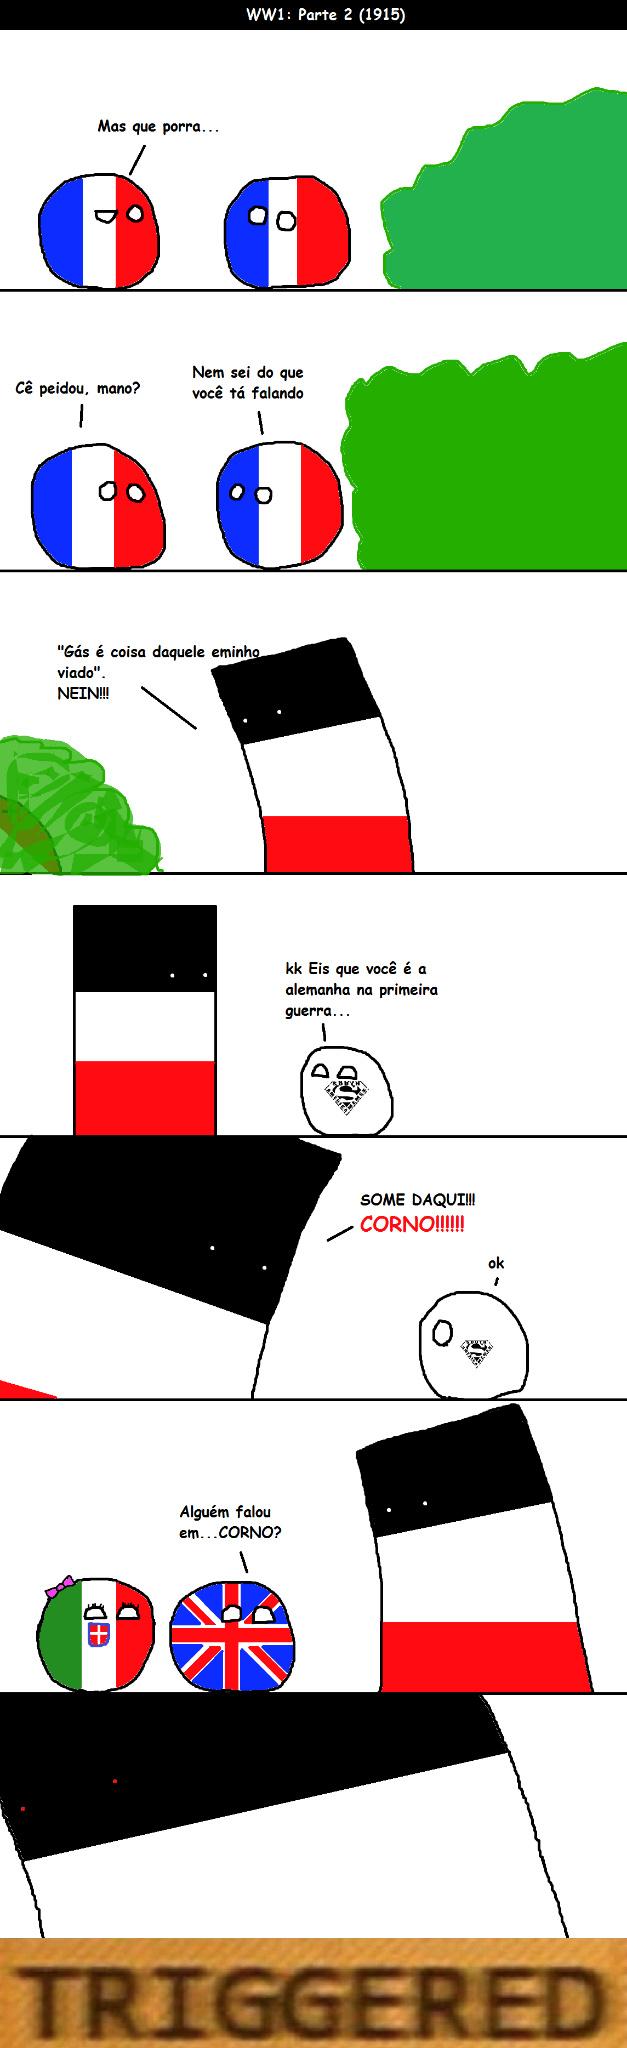 WW1 Parte 2 (1915) - meme